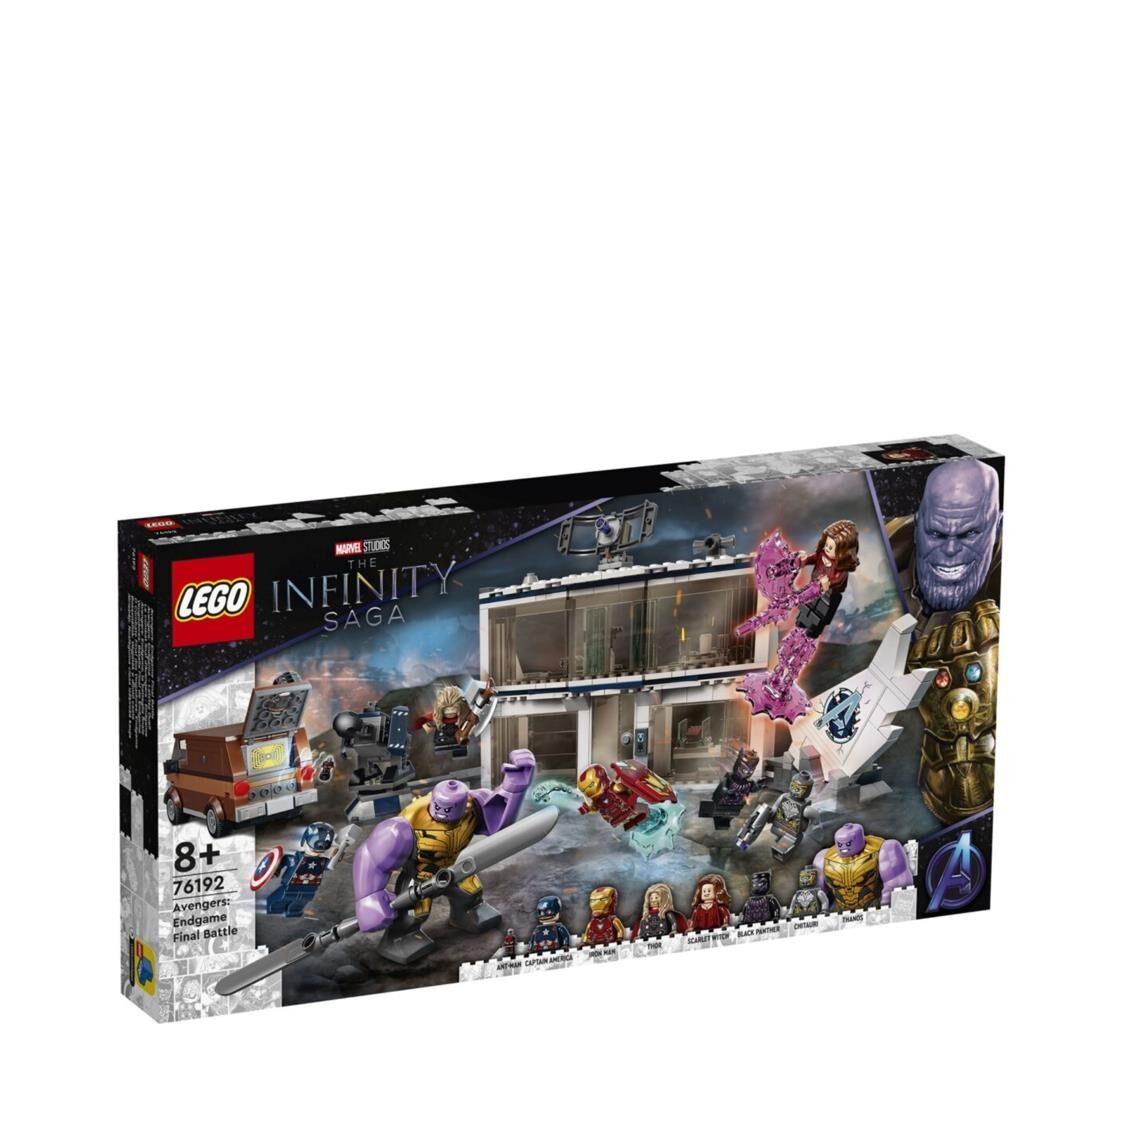 LEGO Super Heroes - Avengers Endgame Final Battle 76192